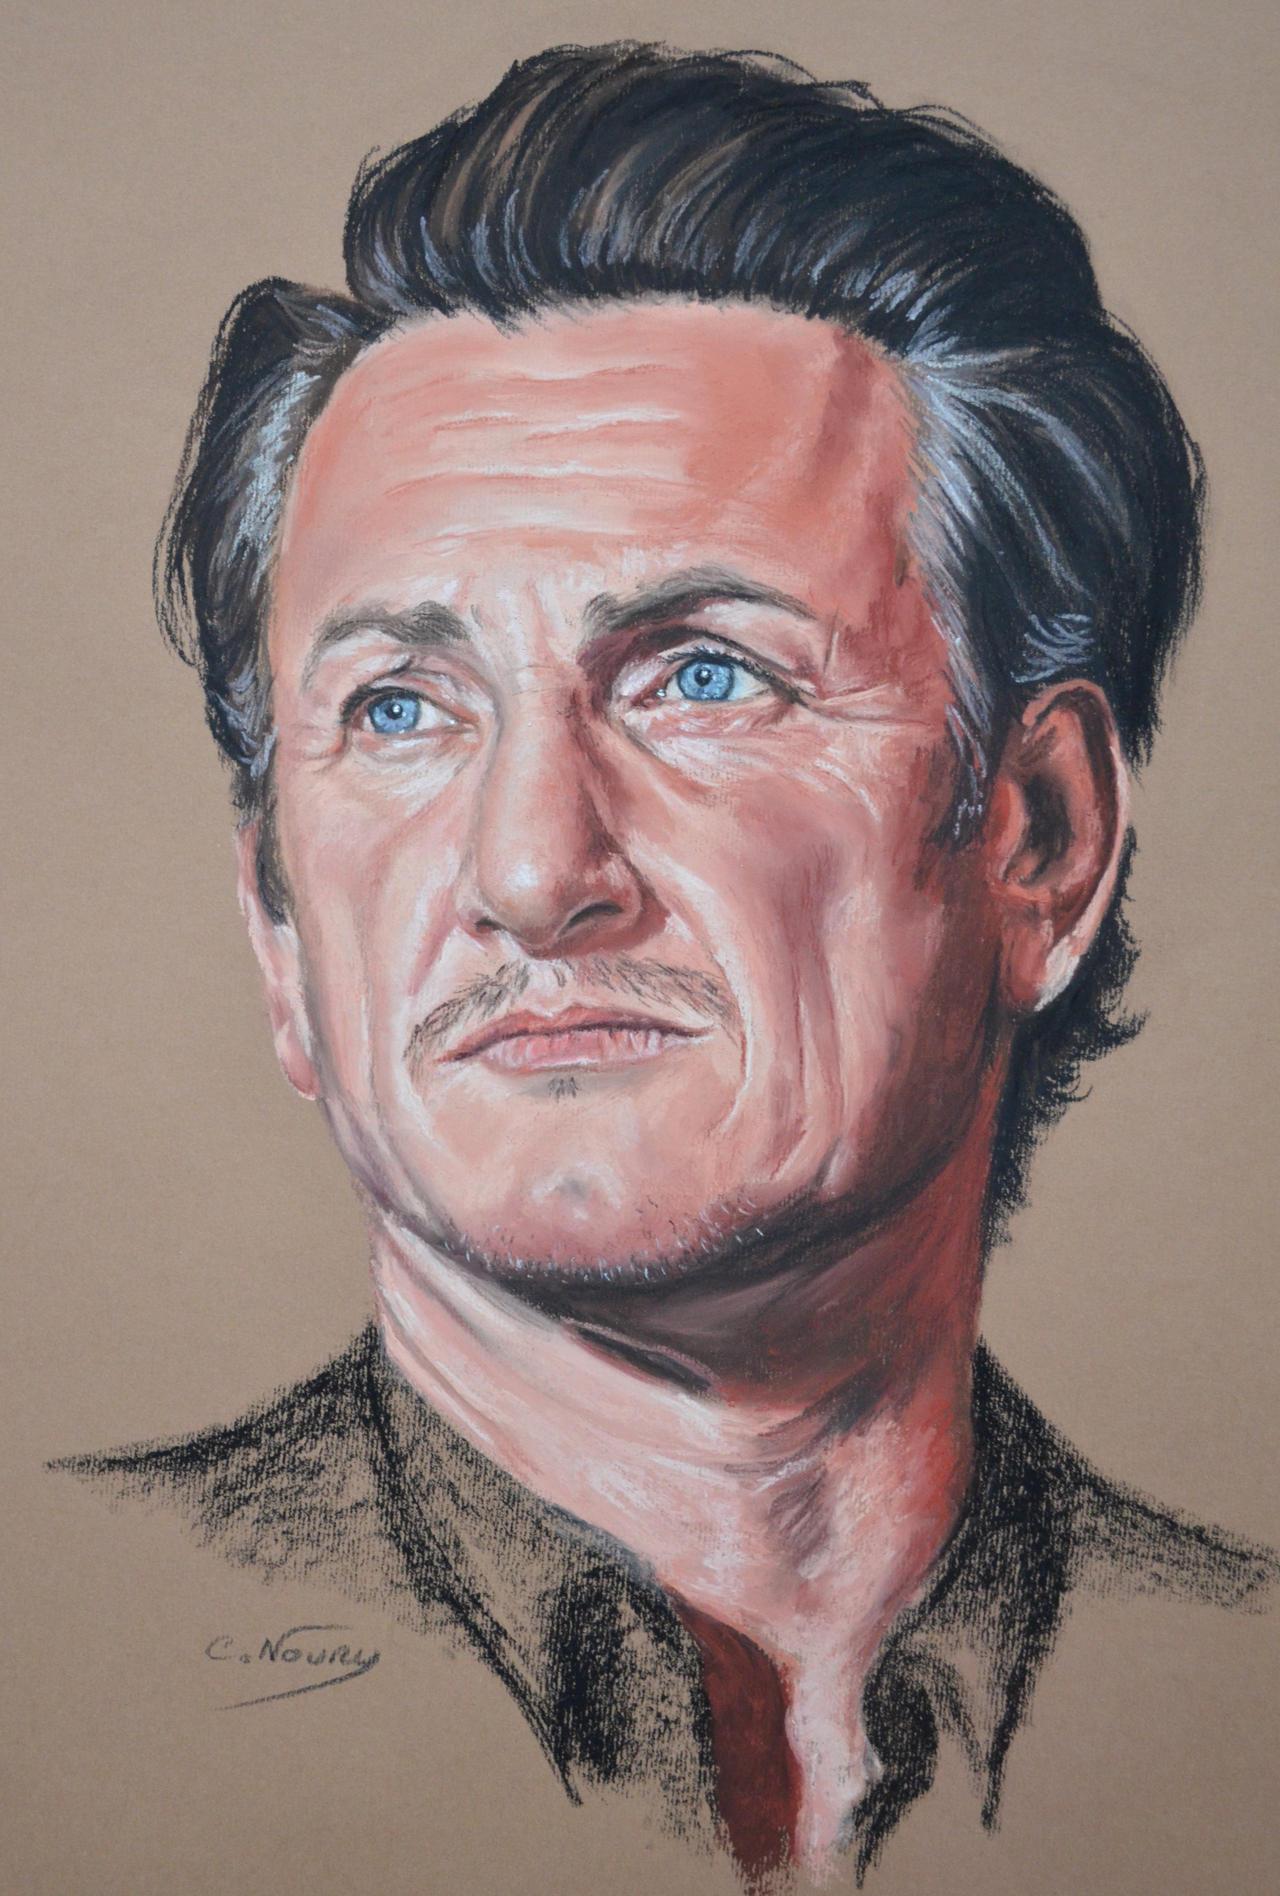 Sean Penn portrait by Andromaque78